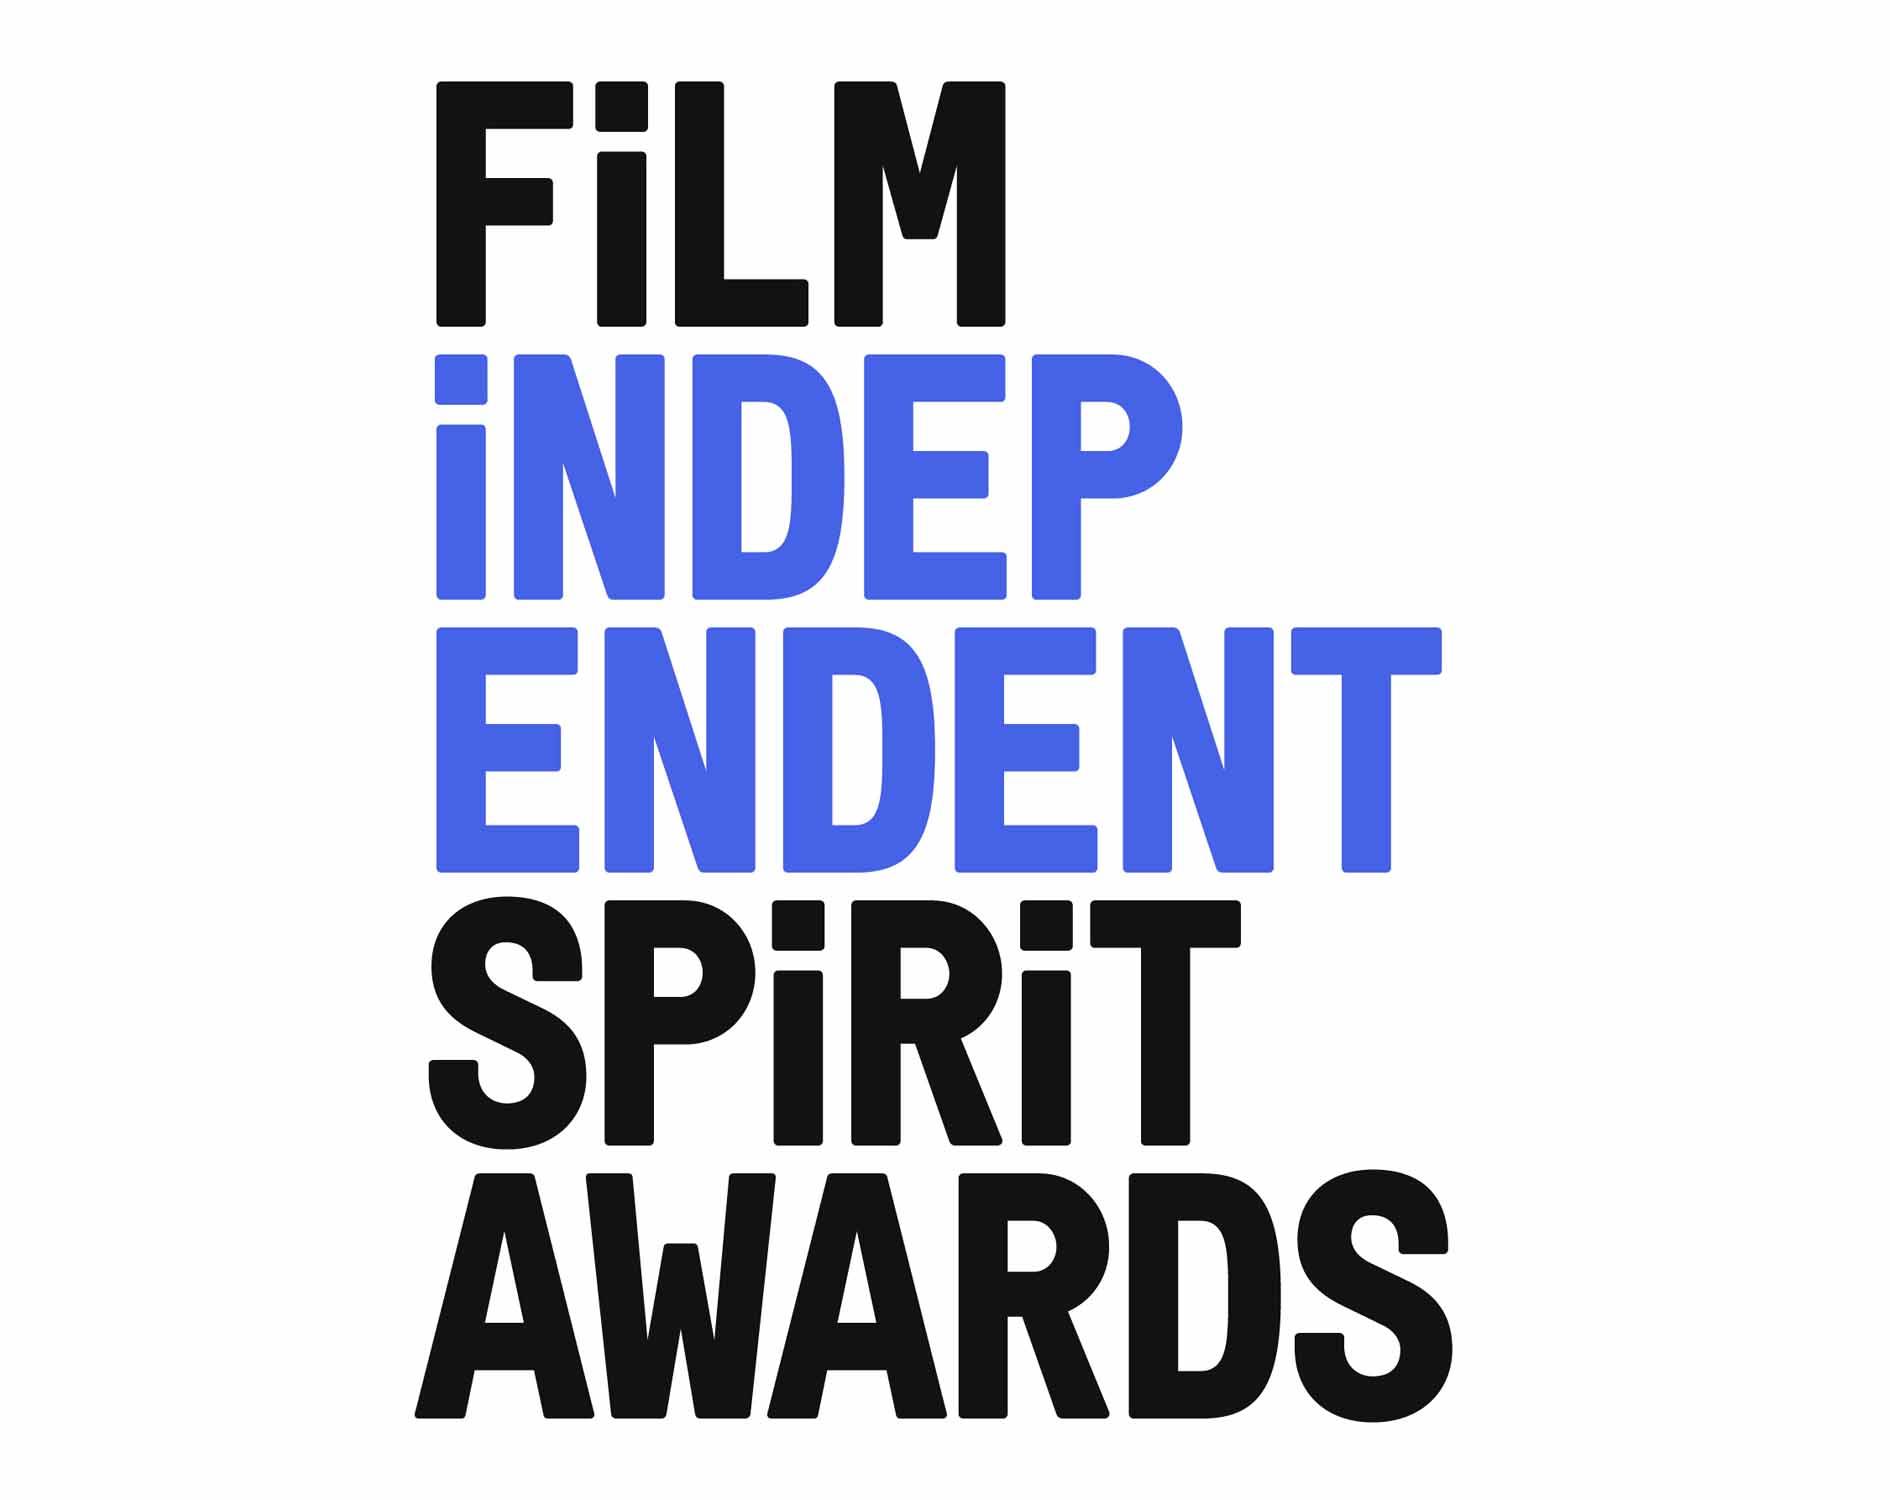 Carol leads Independent Spirit Award nominations